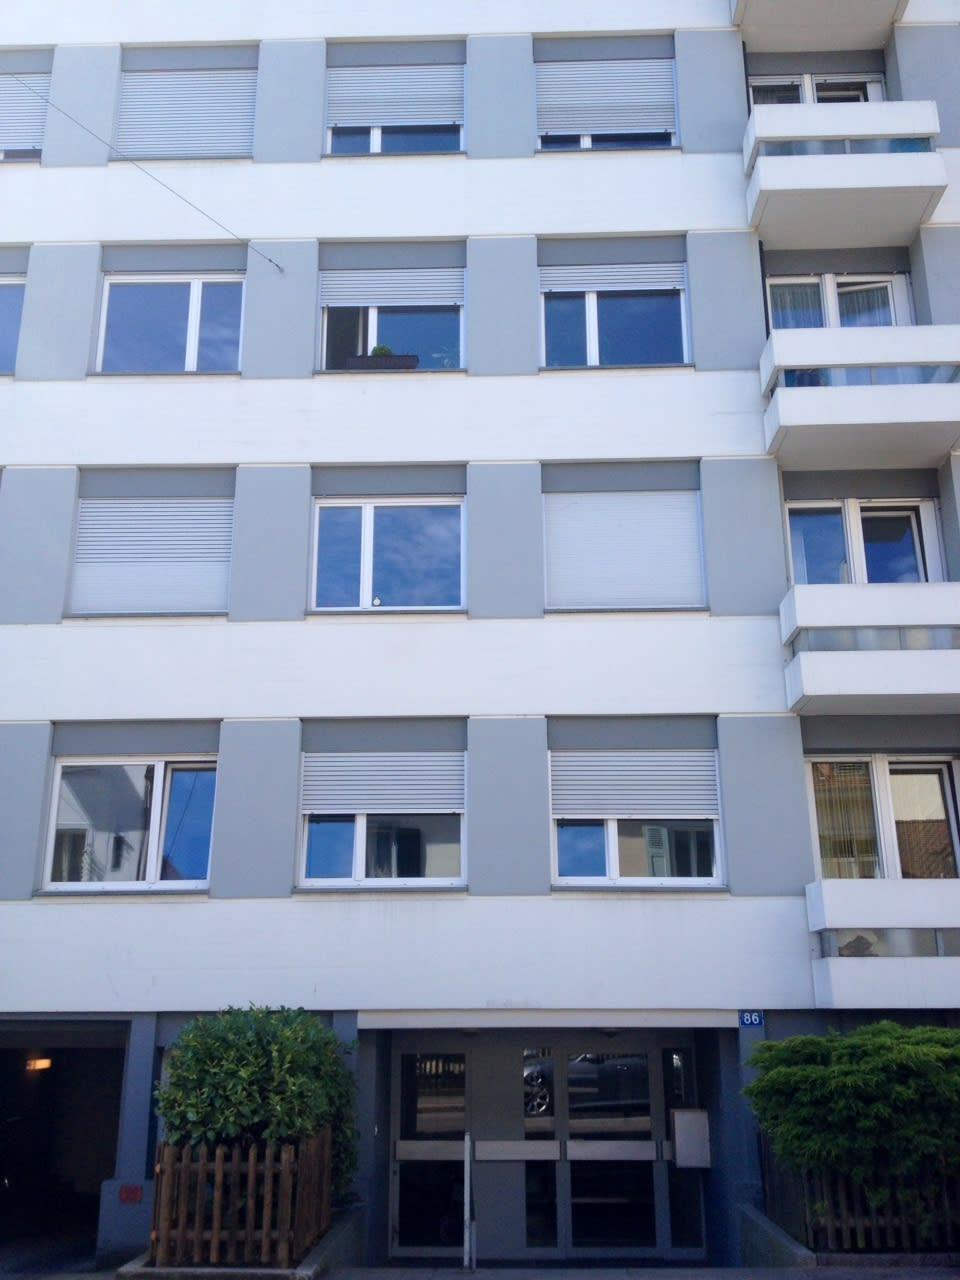 Amerbachstrasse 86